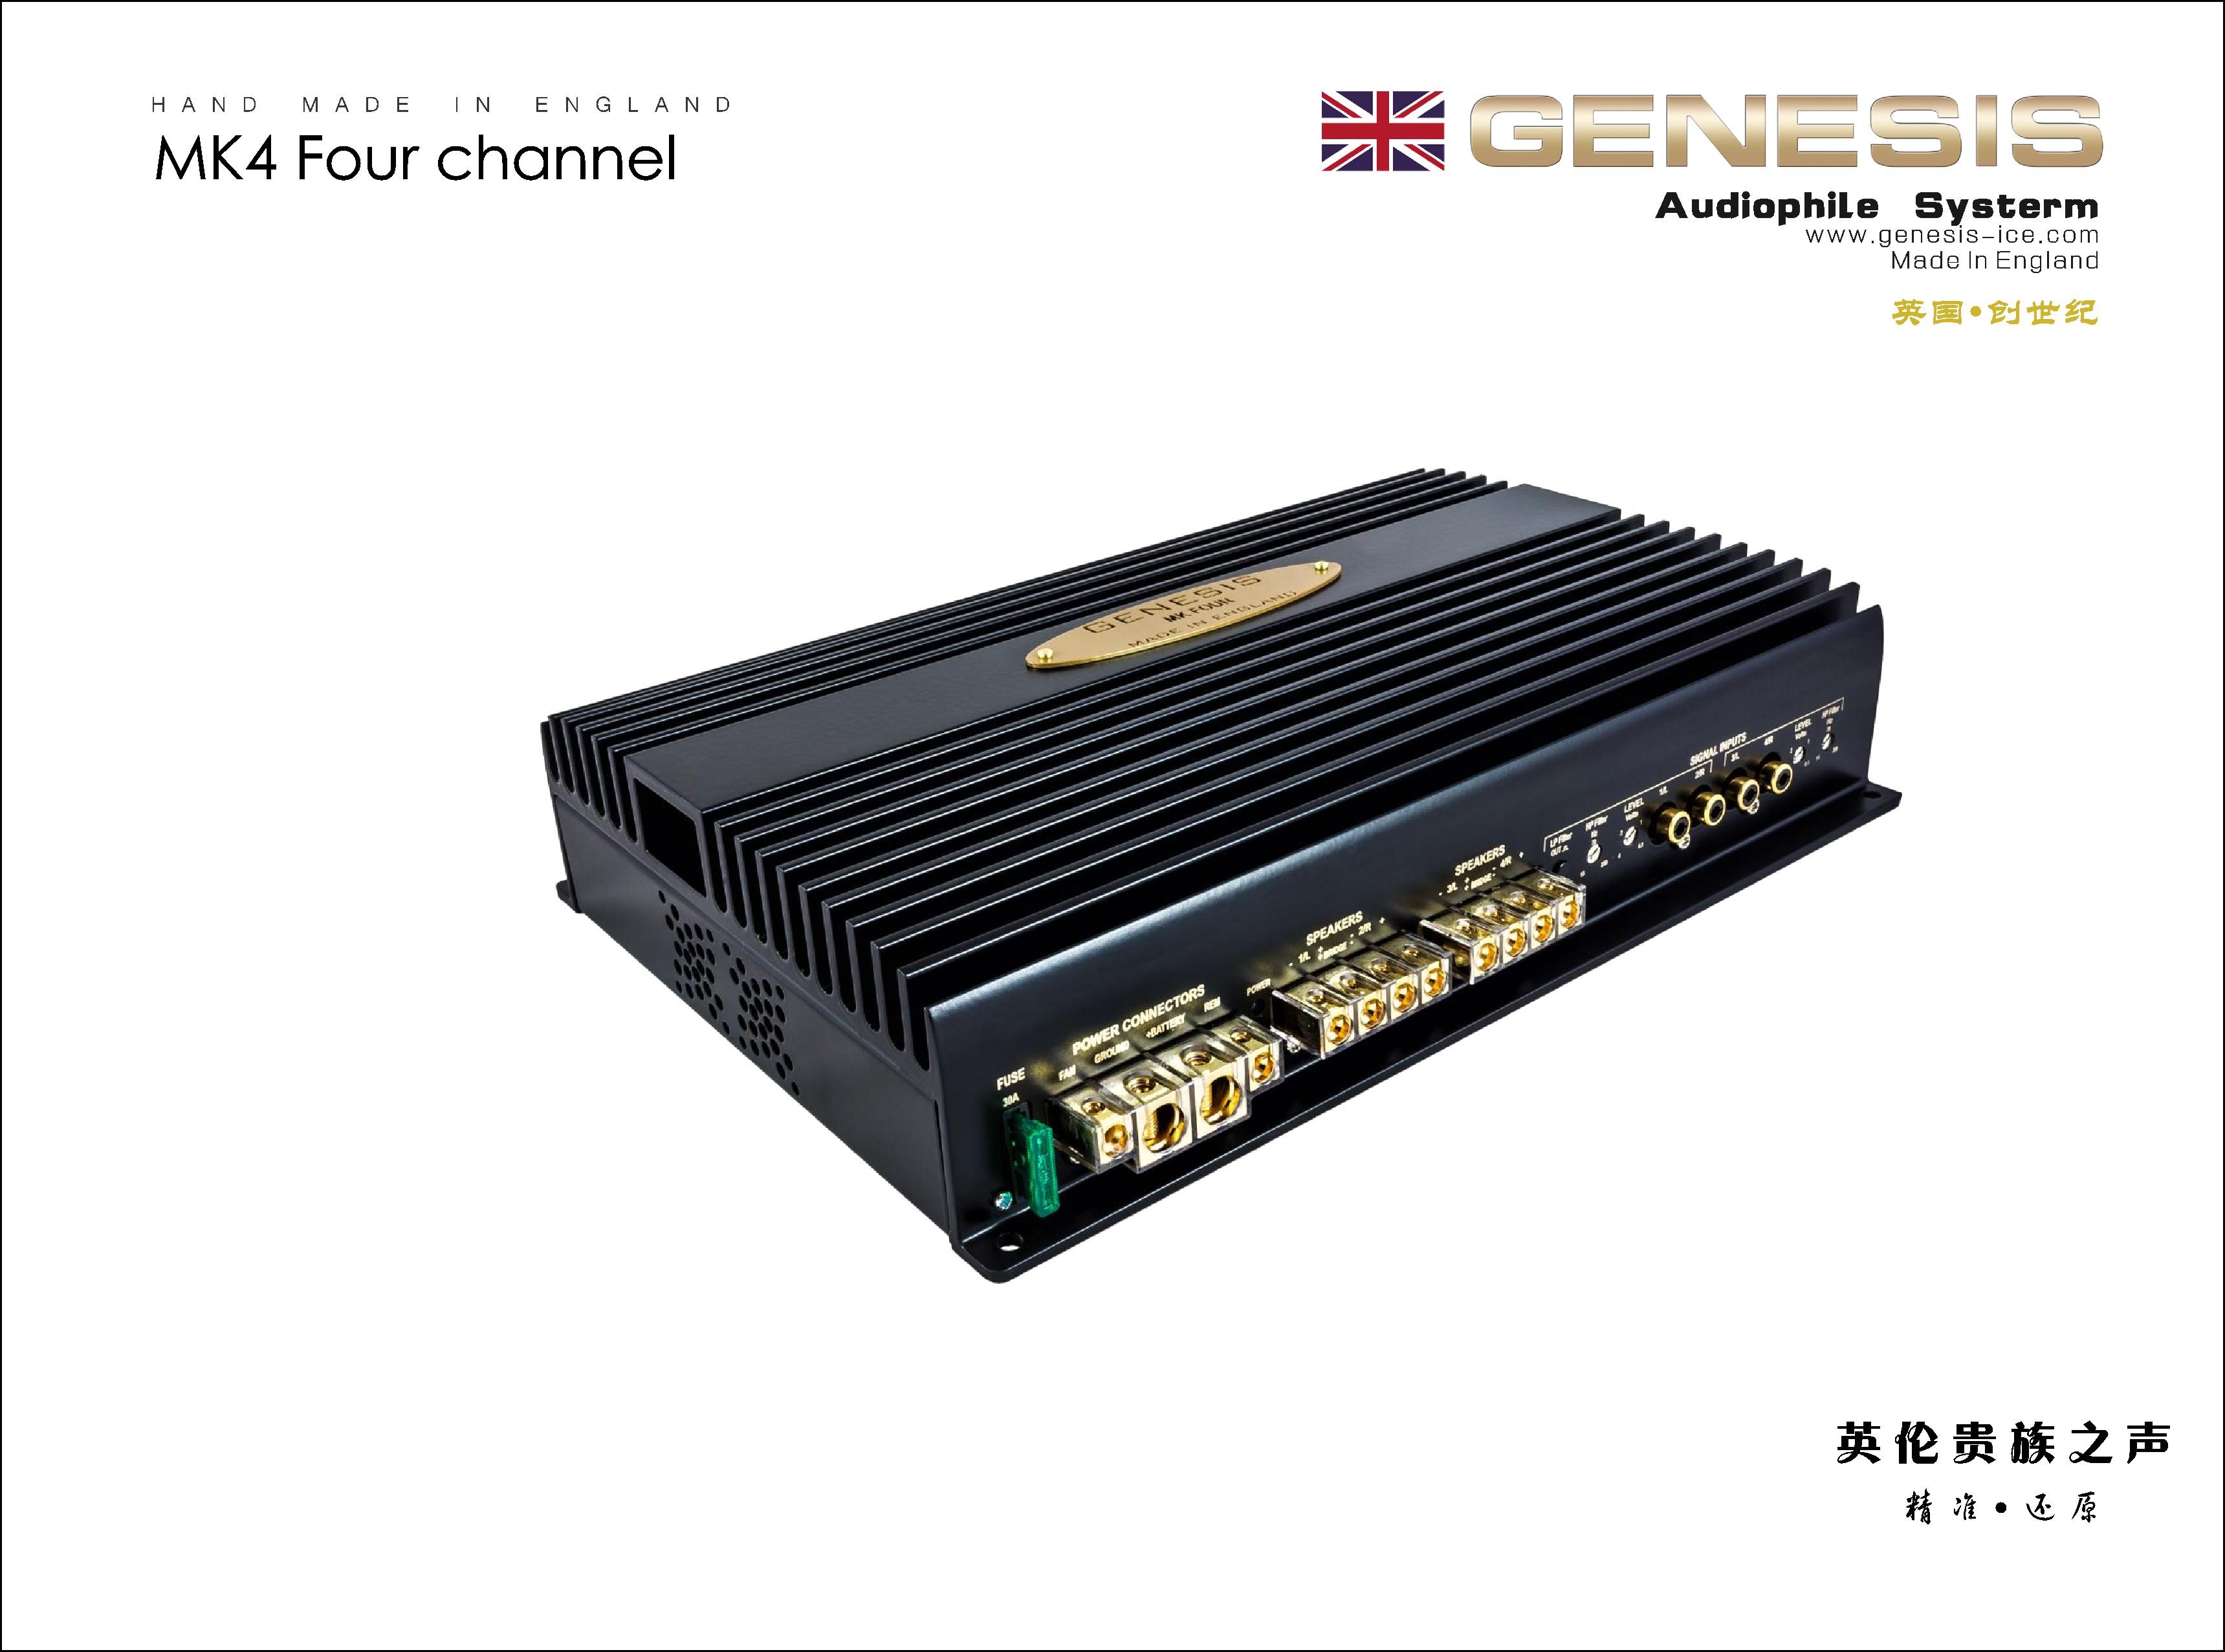 MK4 Four channel